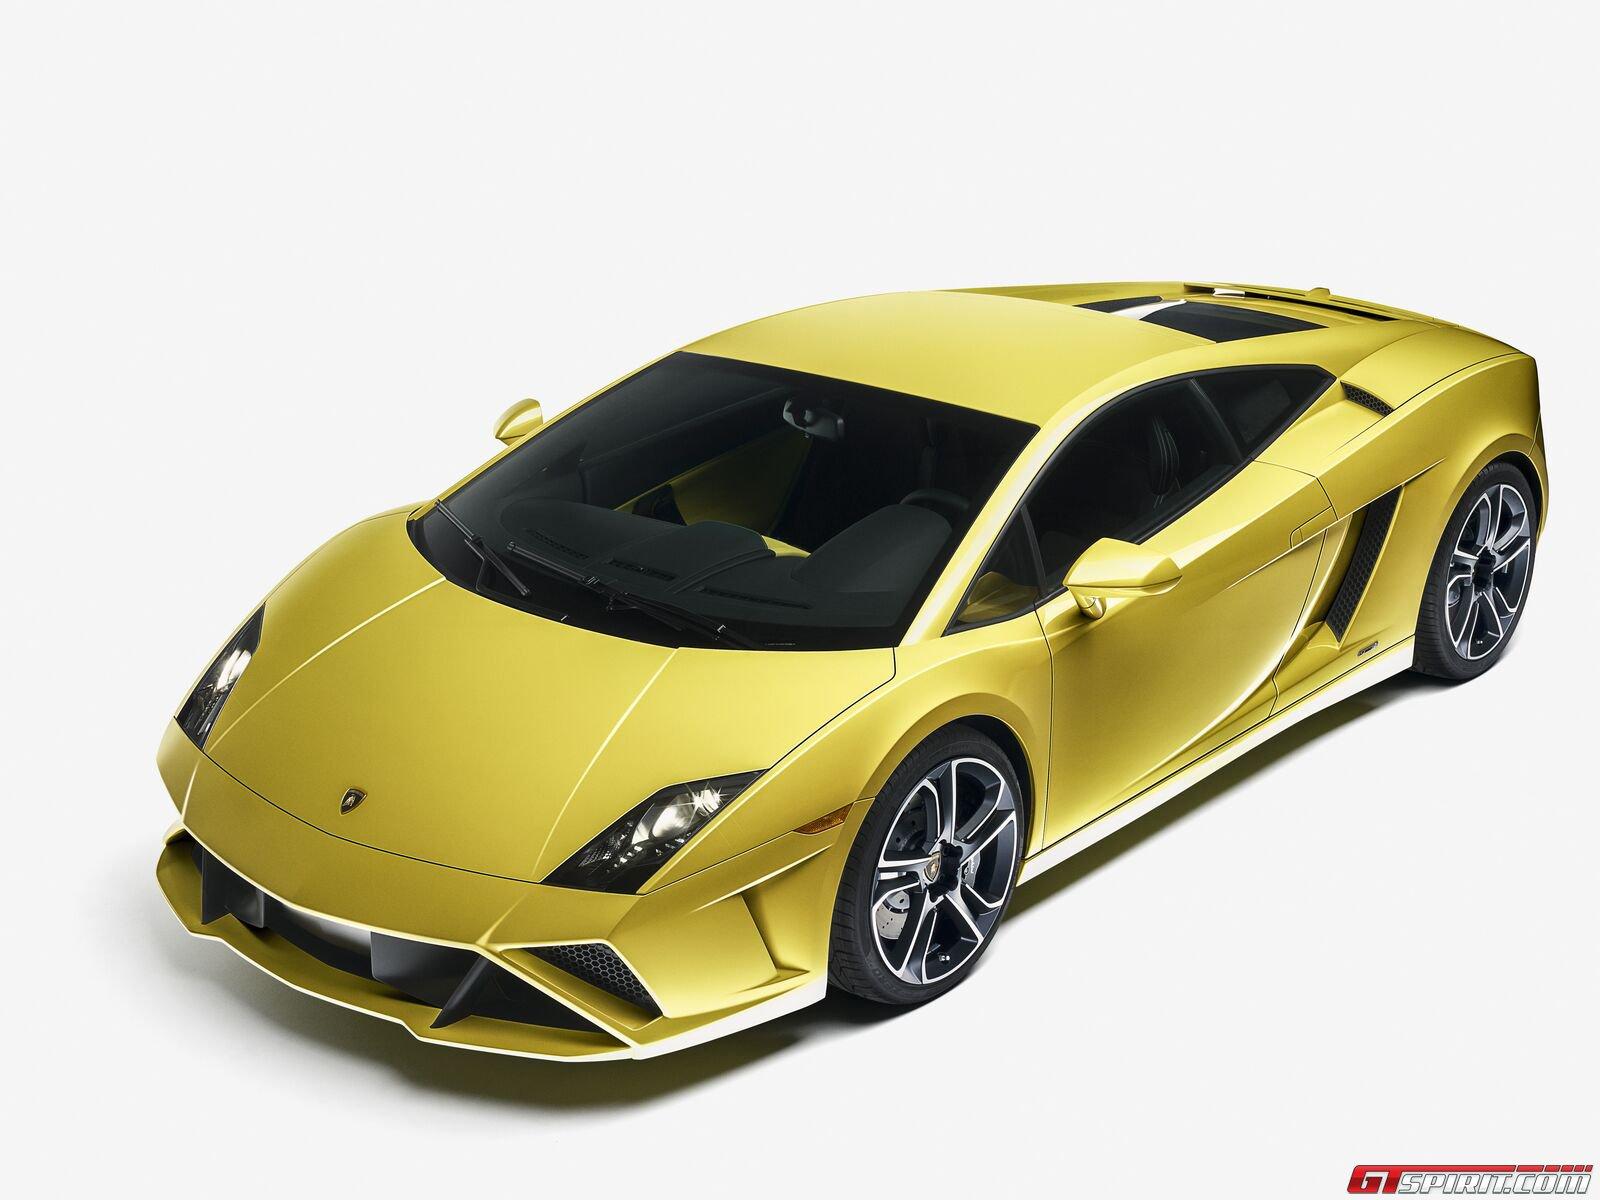 Lamborghini Gallardo LP560-4 Facelift Photo 1